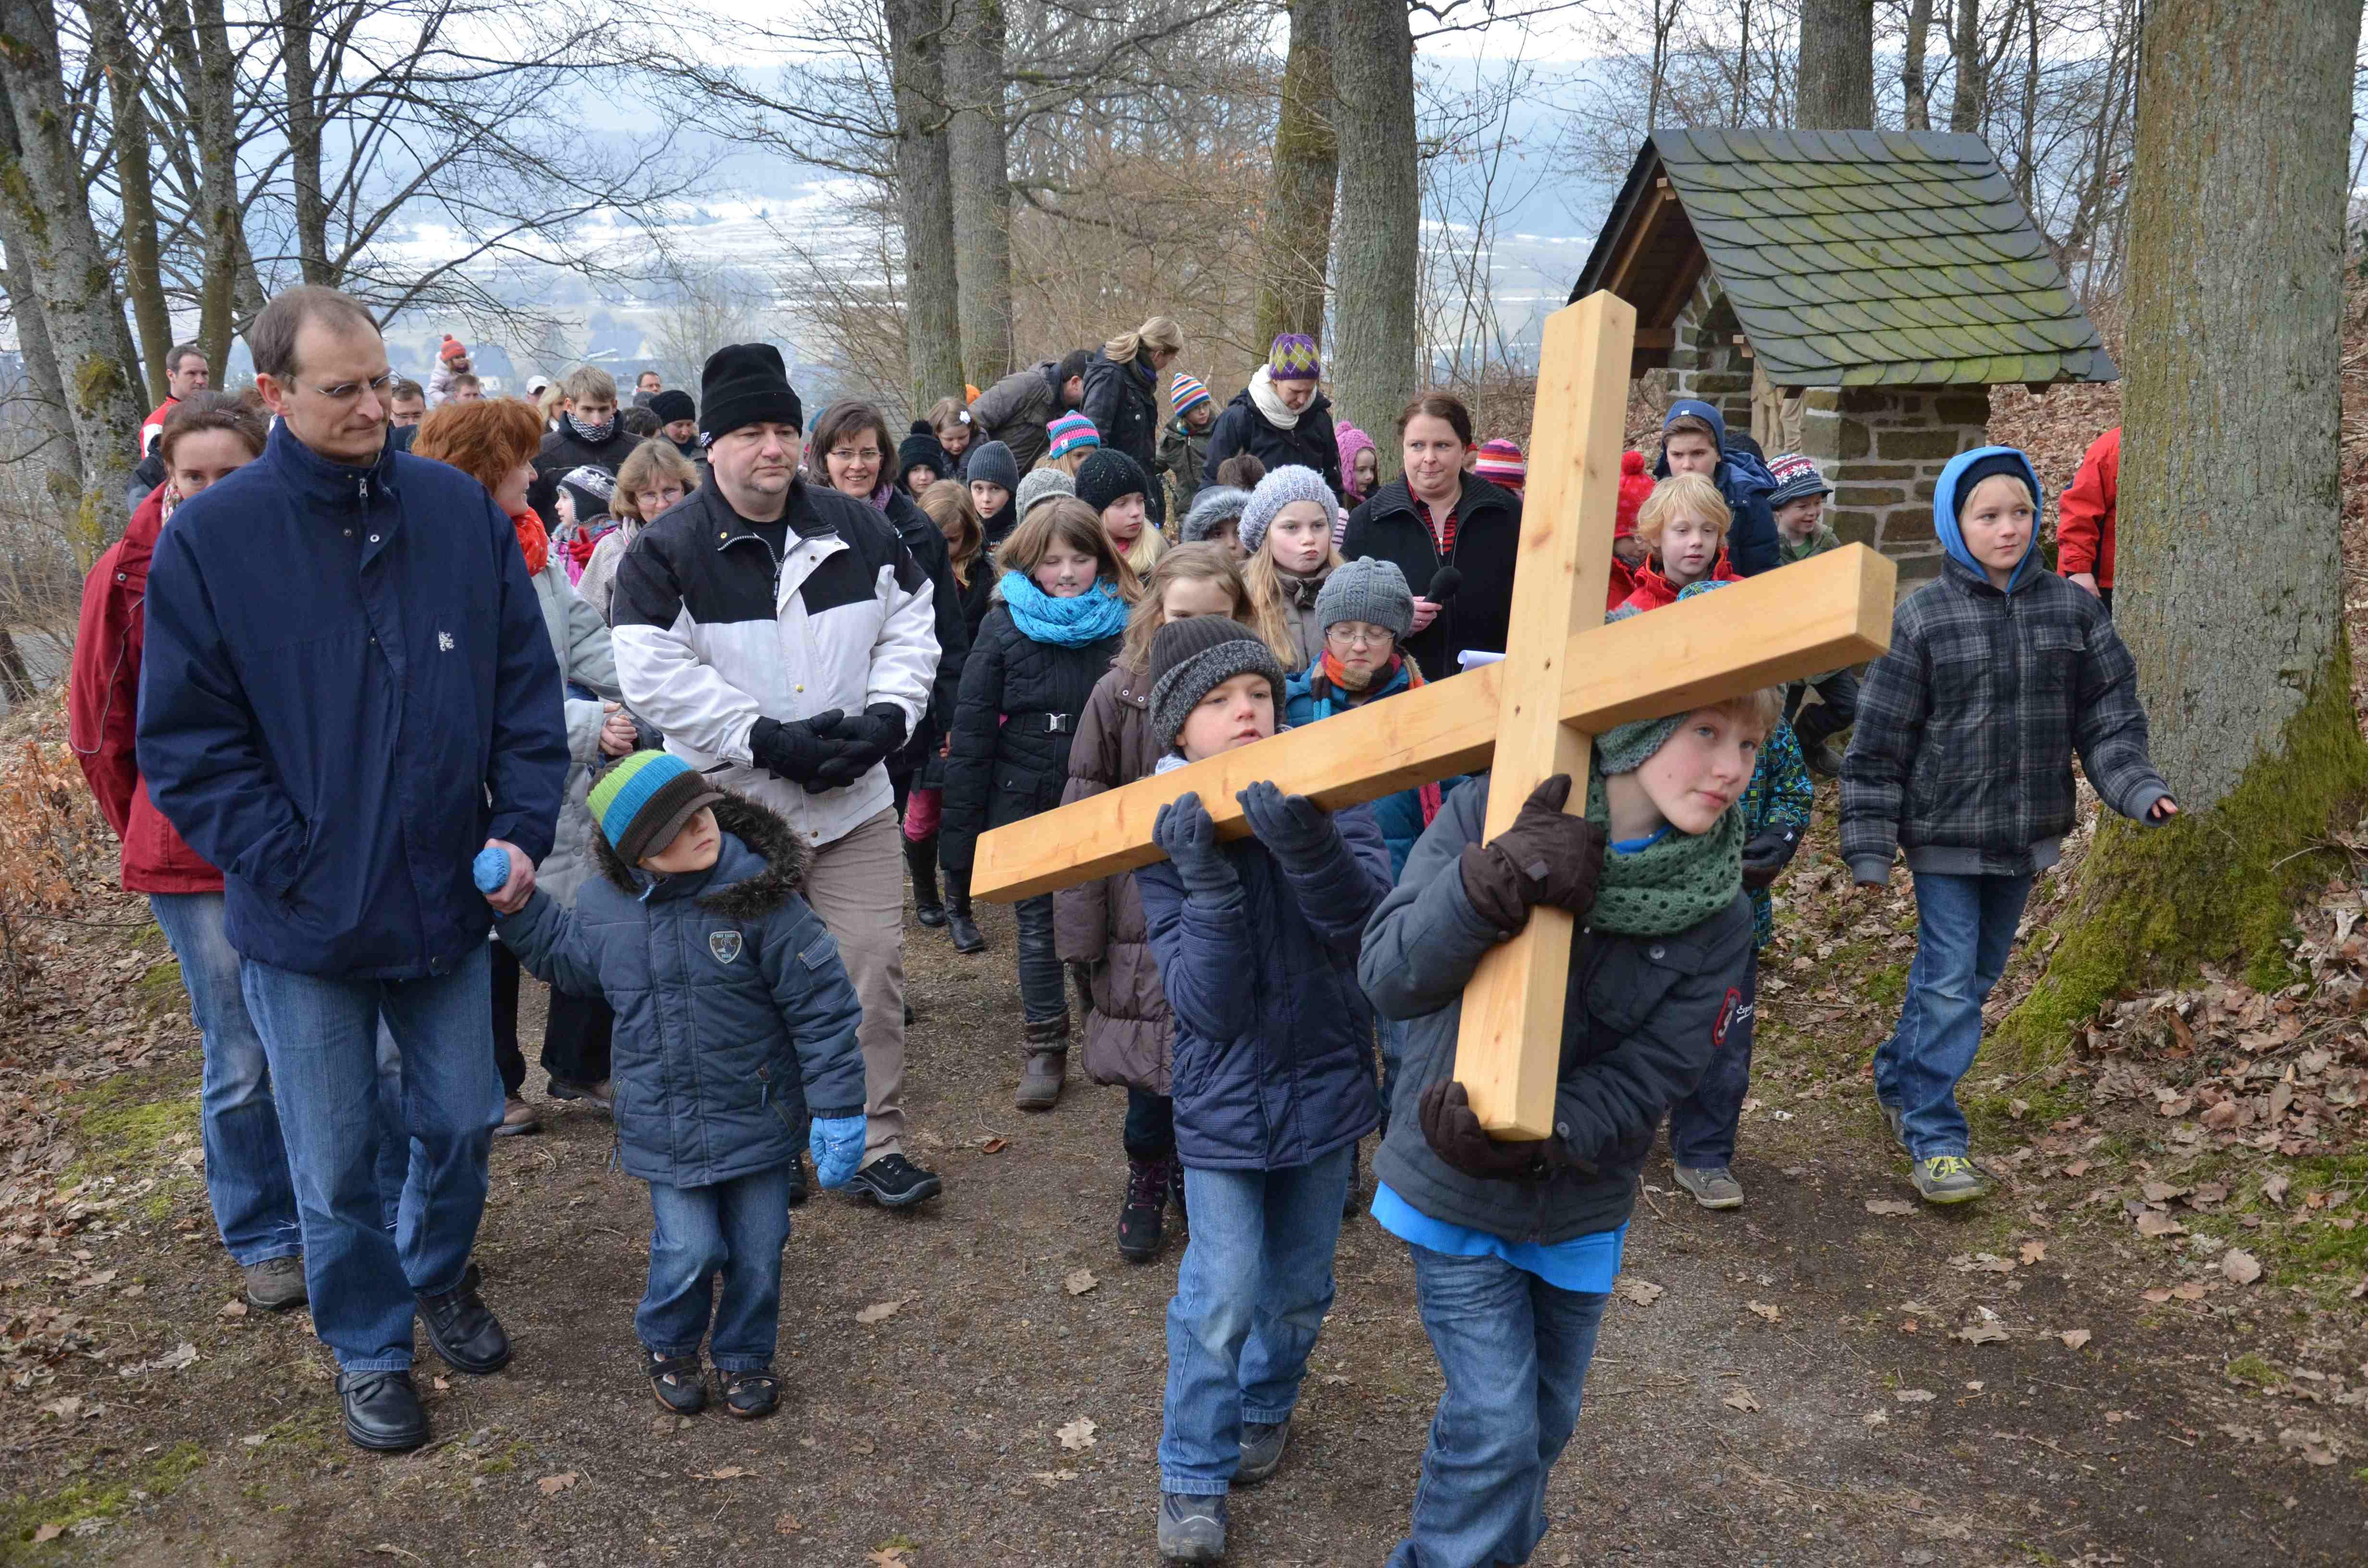 Kinderkreuzweg zum Pfarrberg – Leidensweg Christi nachvollzogen